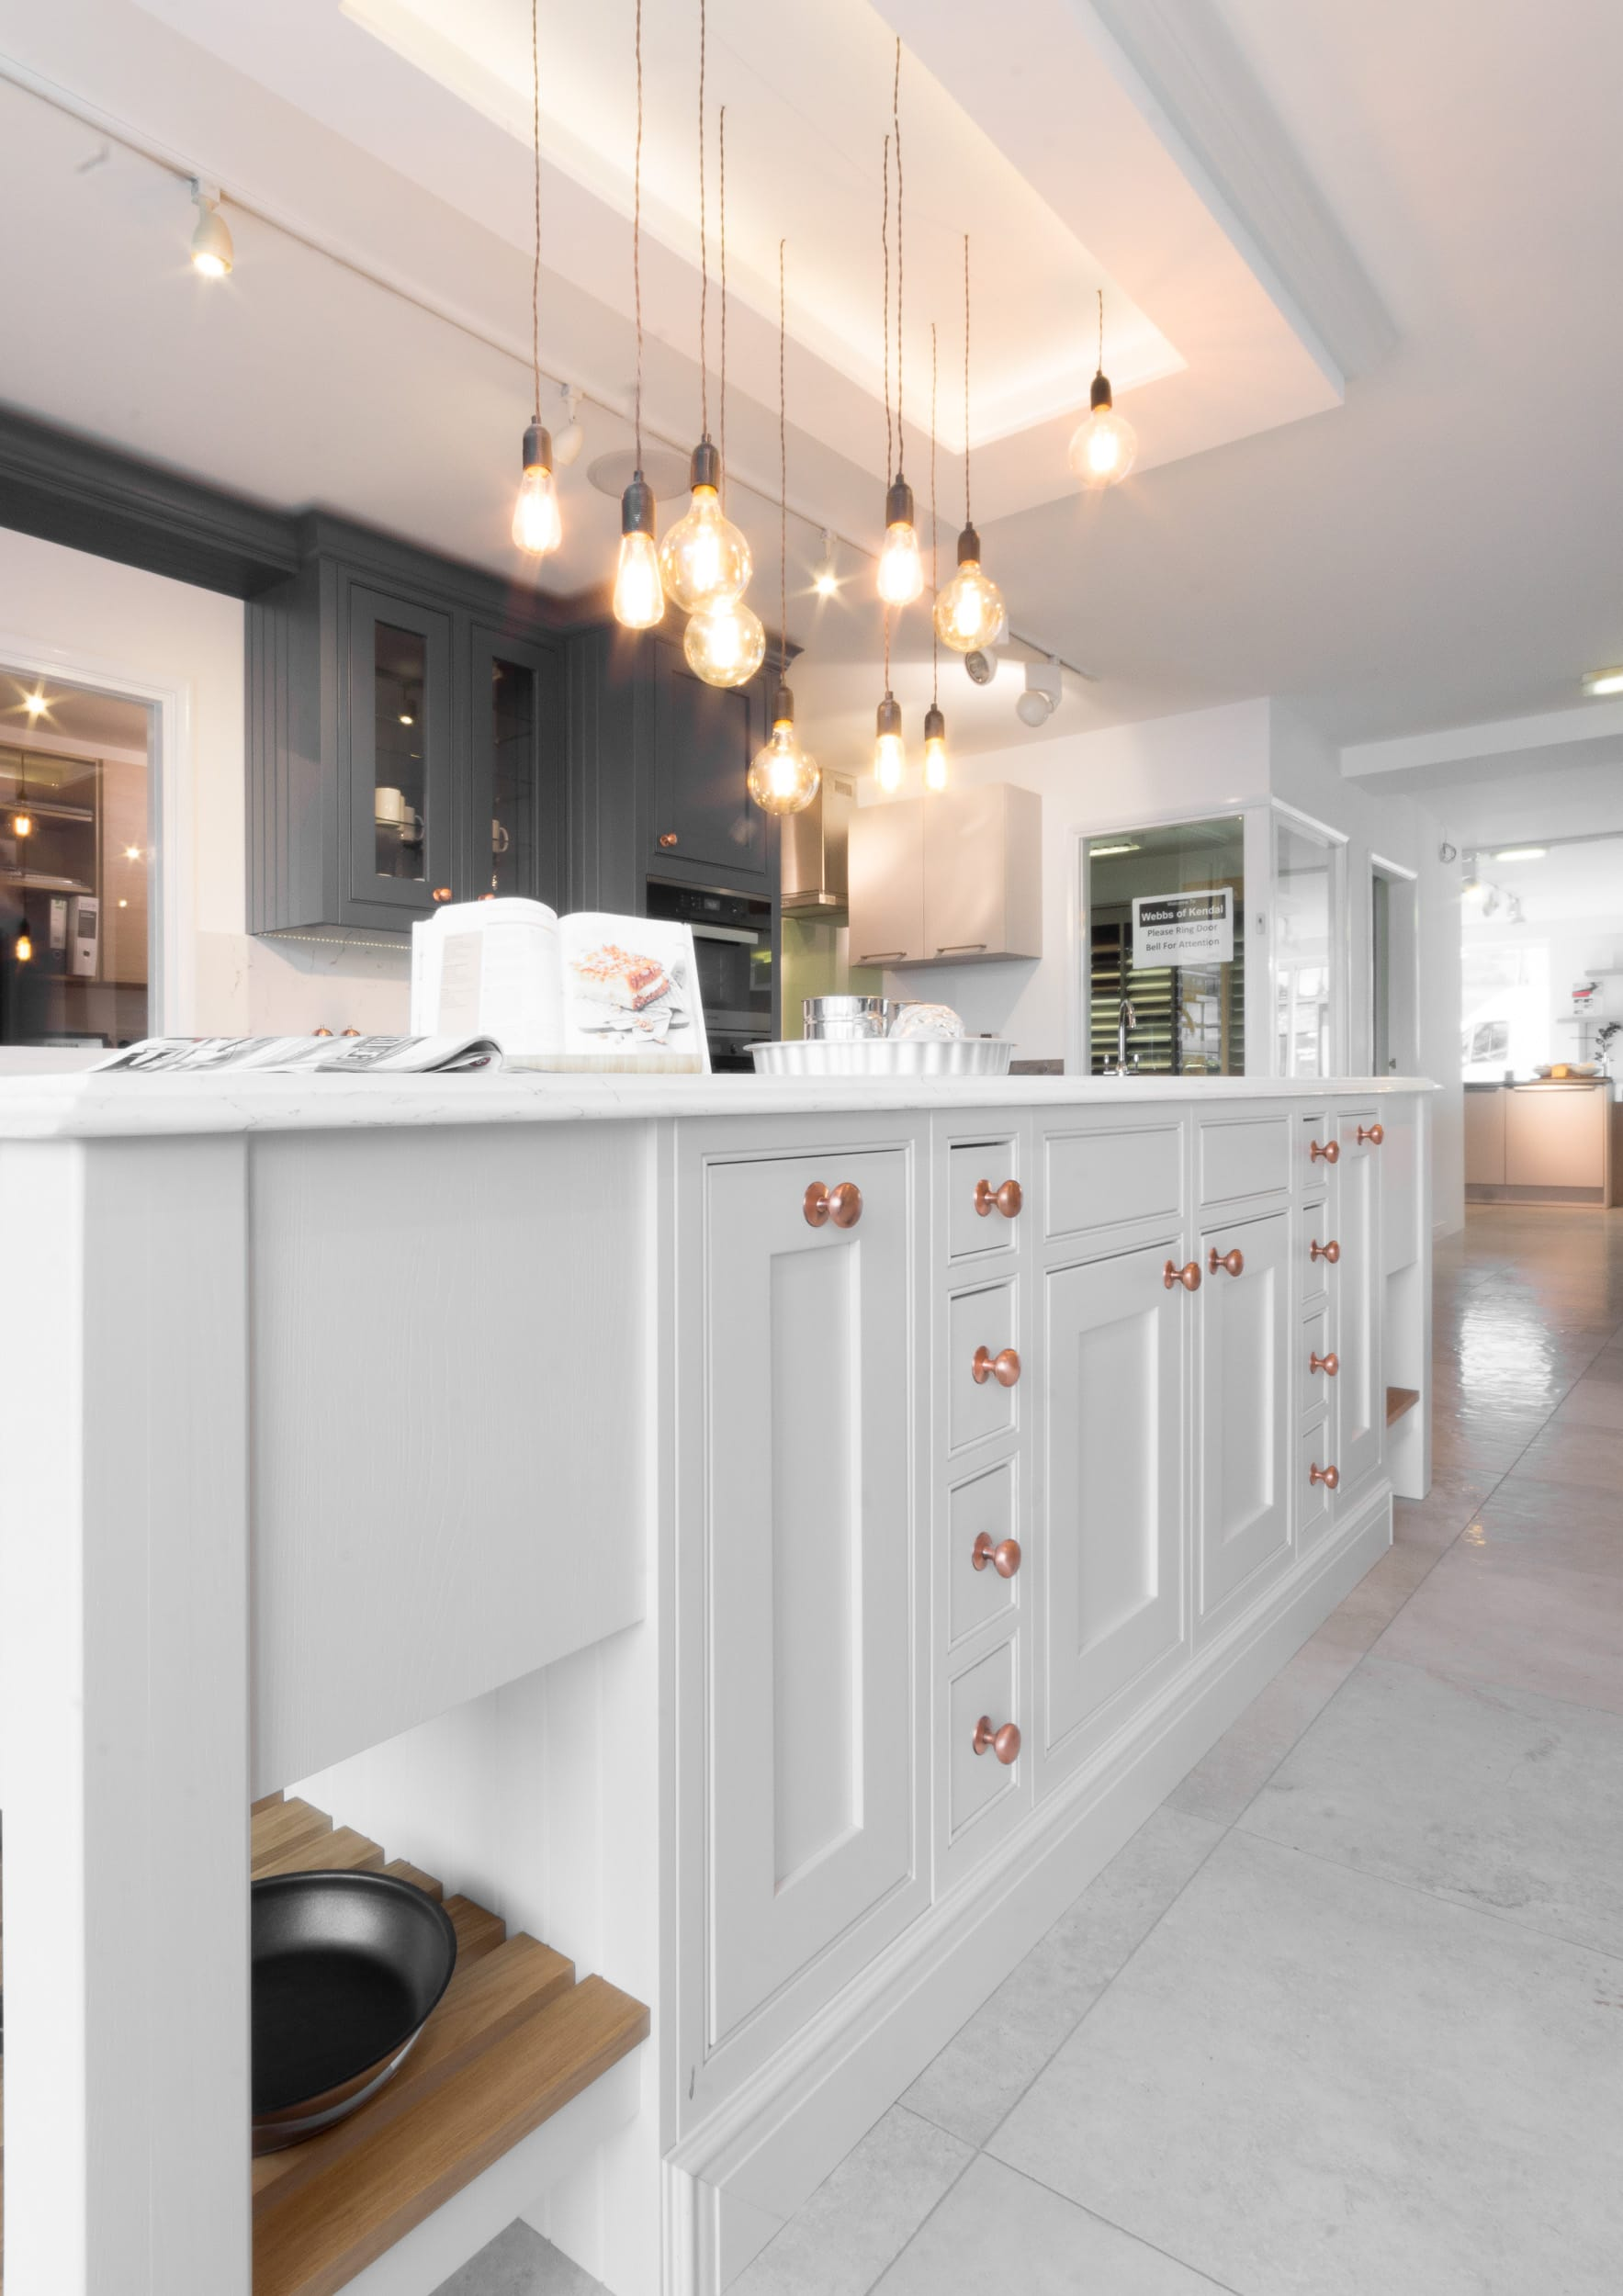 Kitchen-Showroom-Webbs-Kendal-18.jpg